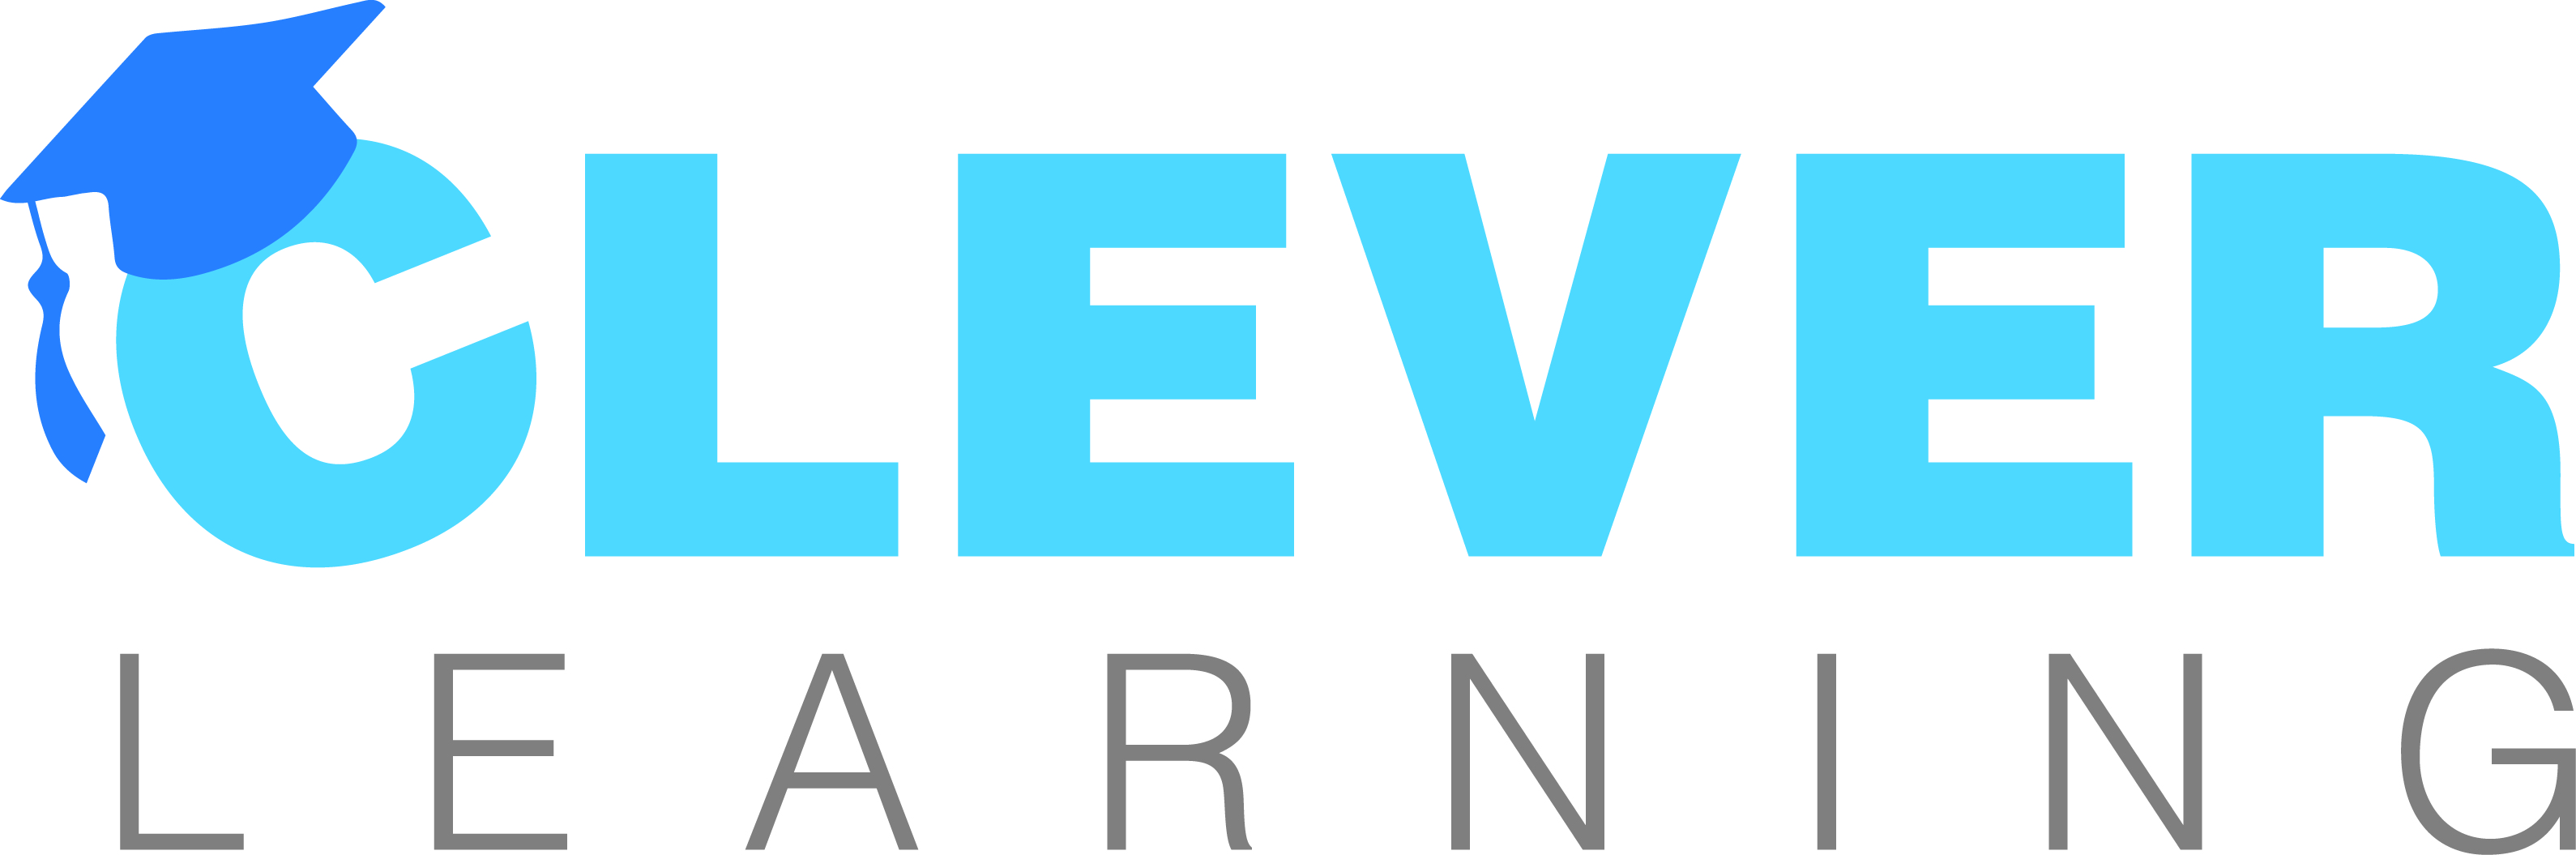 CLEVER_LEARNING_logo.jpg